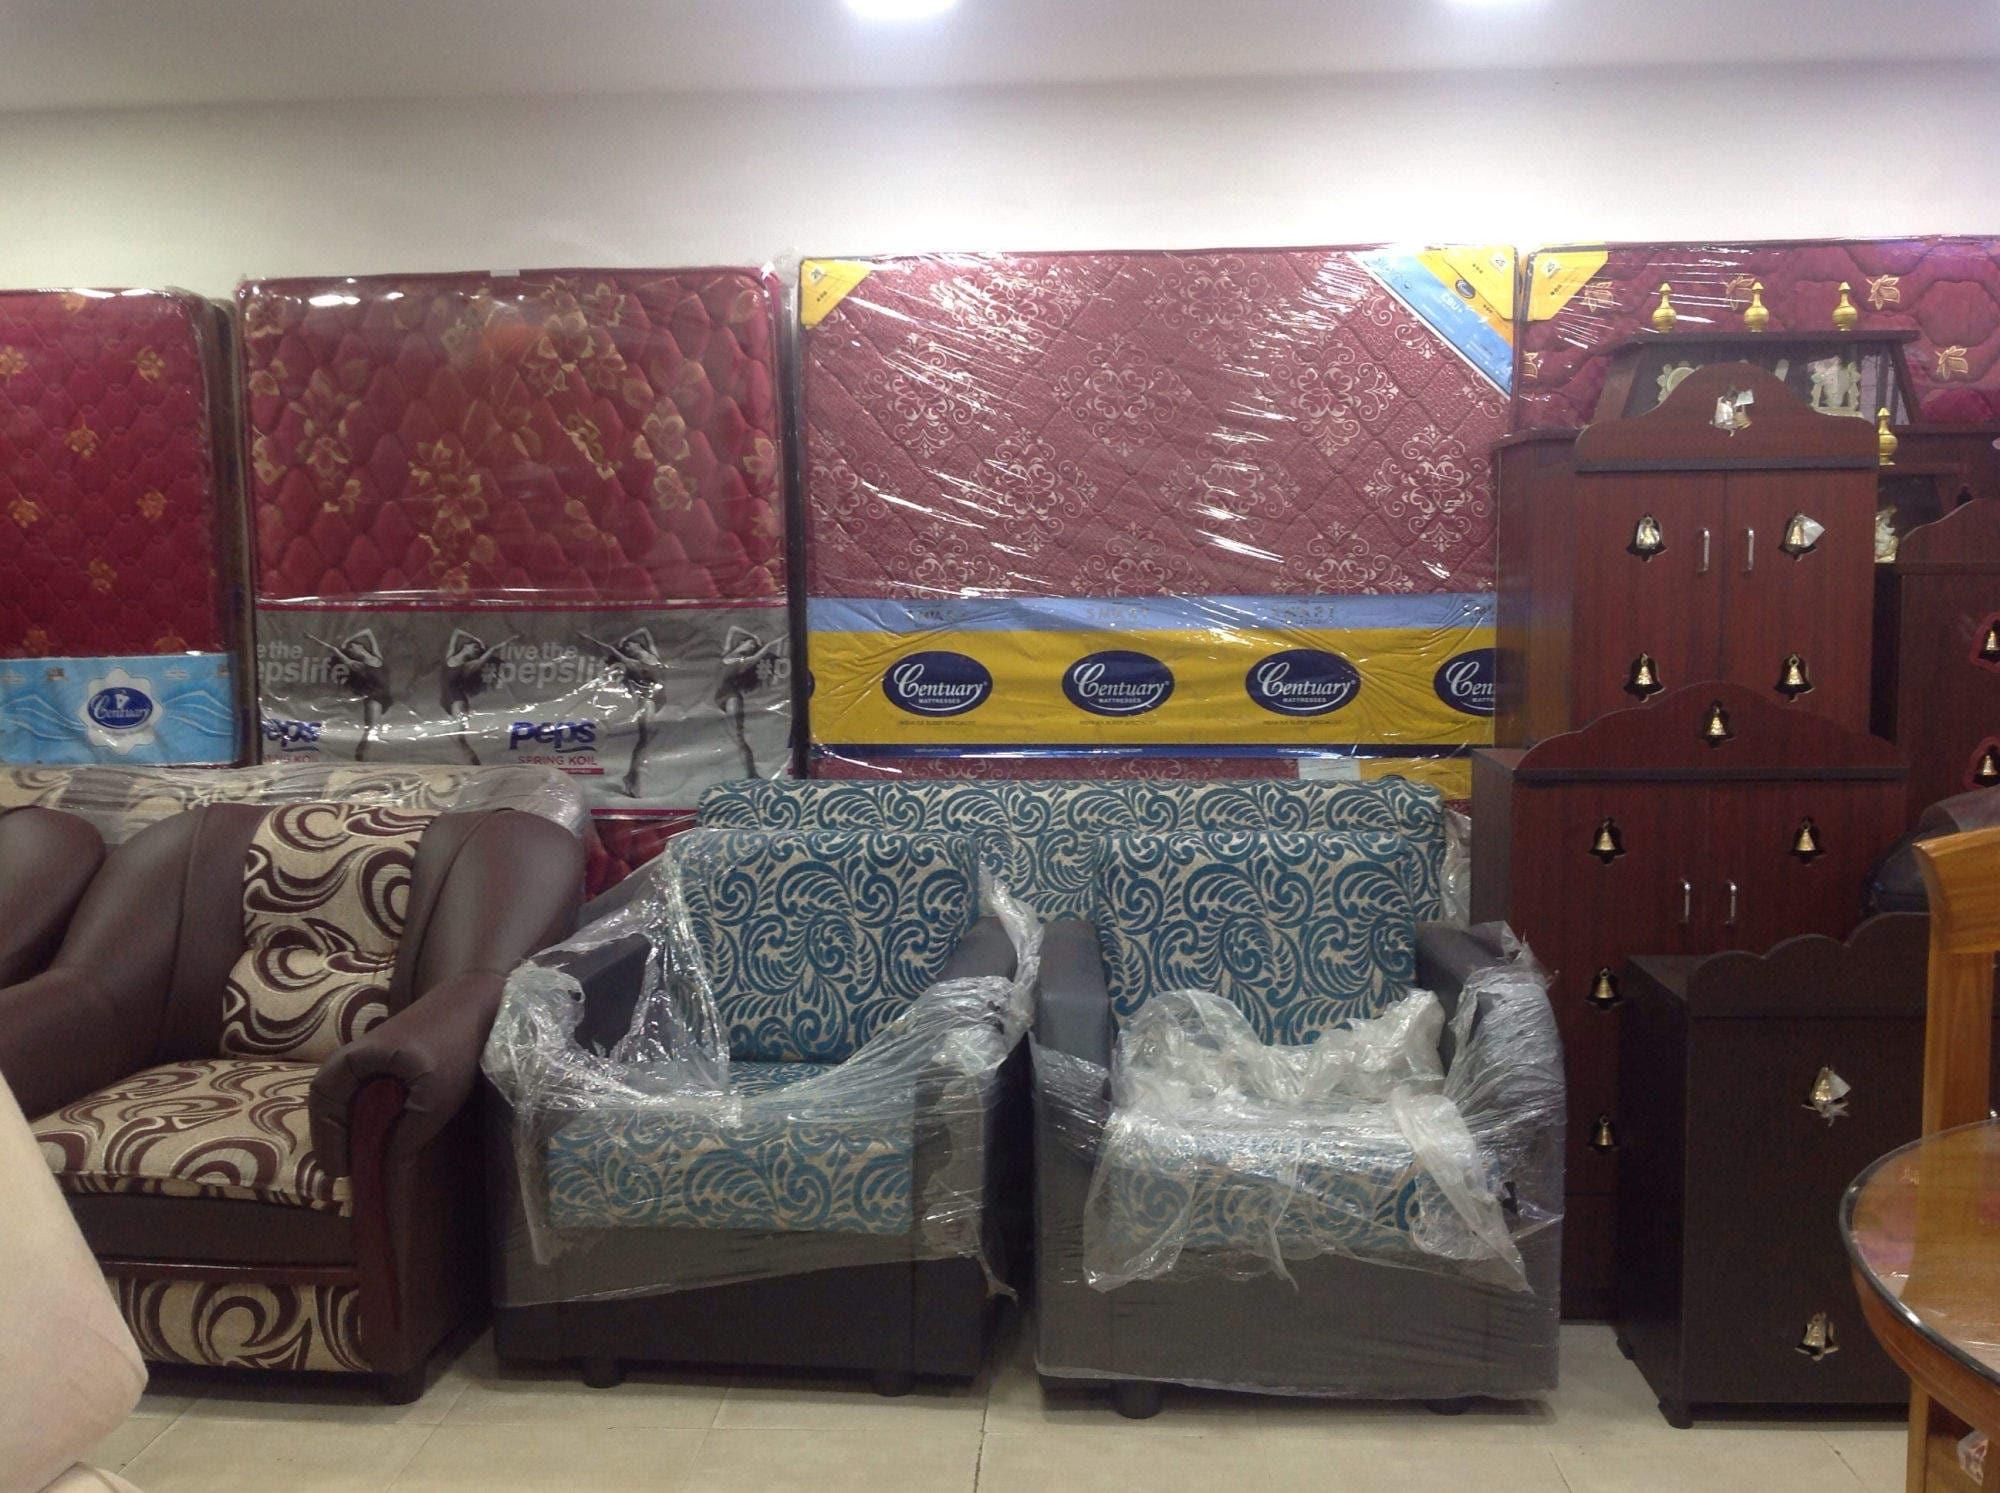 Top 100 Furniture Stores in Porur, Chennai - Furniture Shops